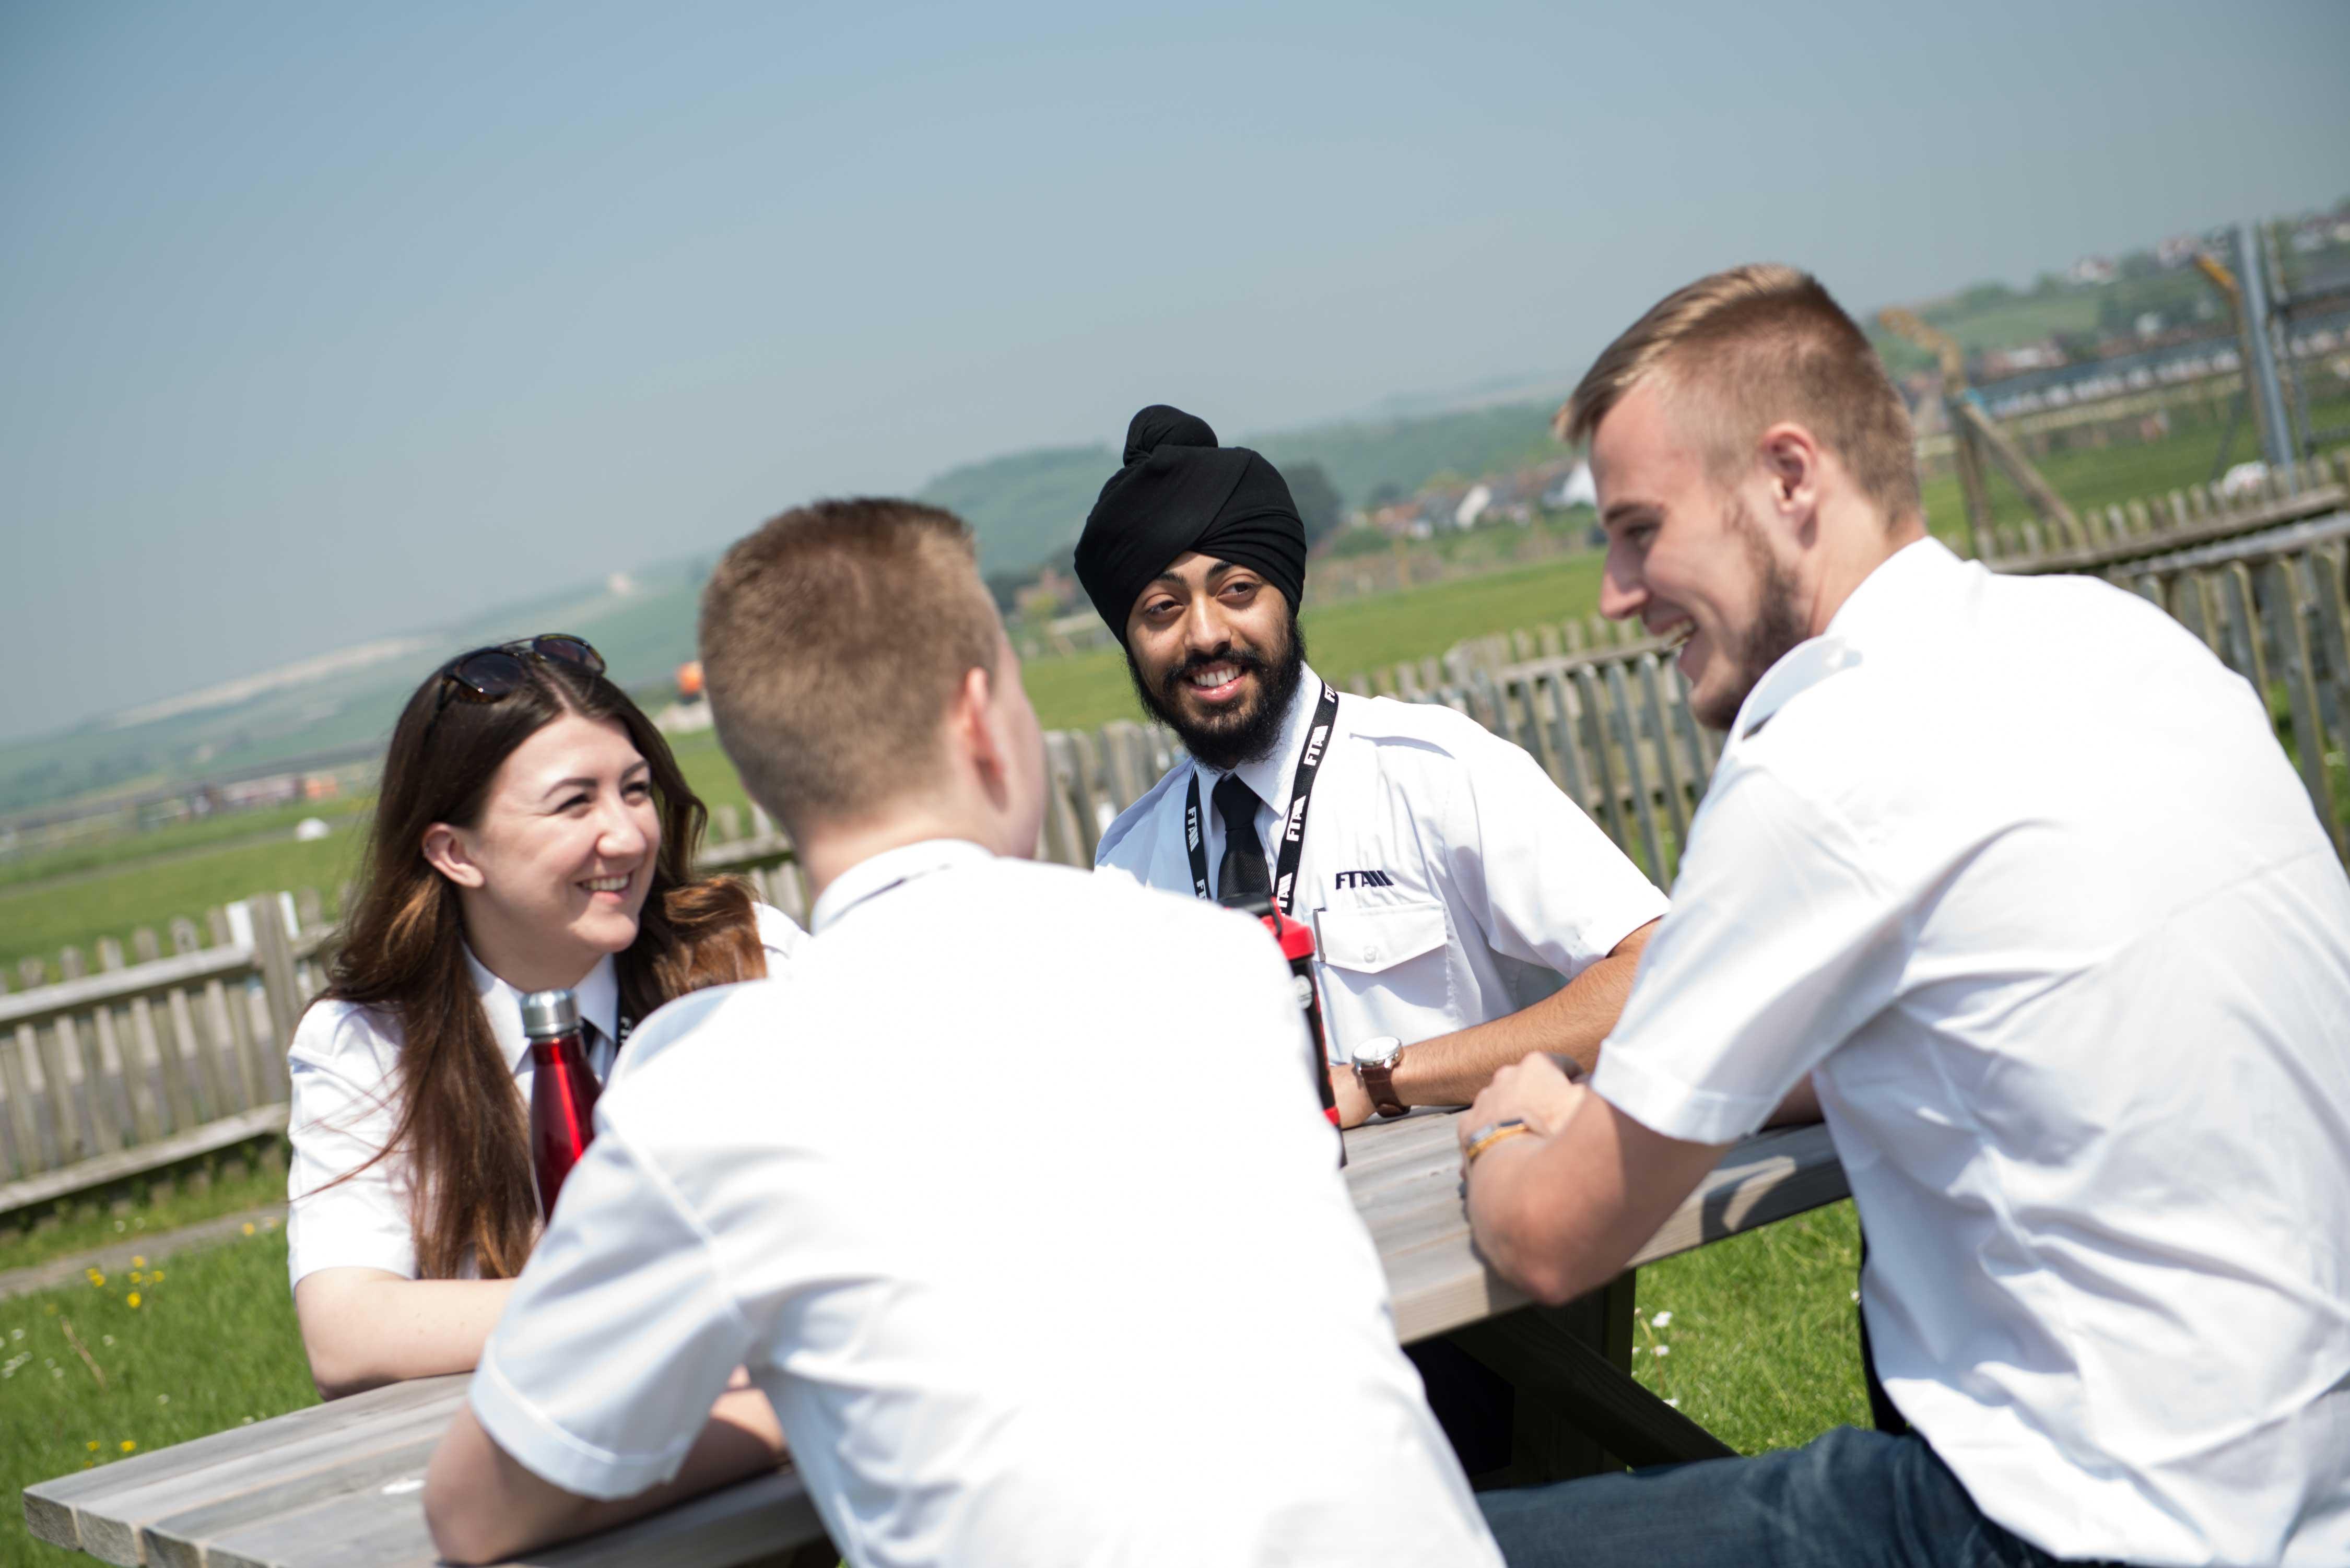 FTA-trainee-pilots-relaxing-happy-lr.jpg